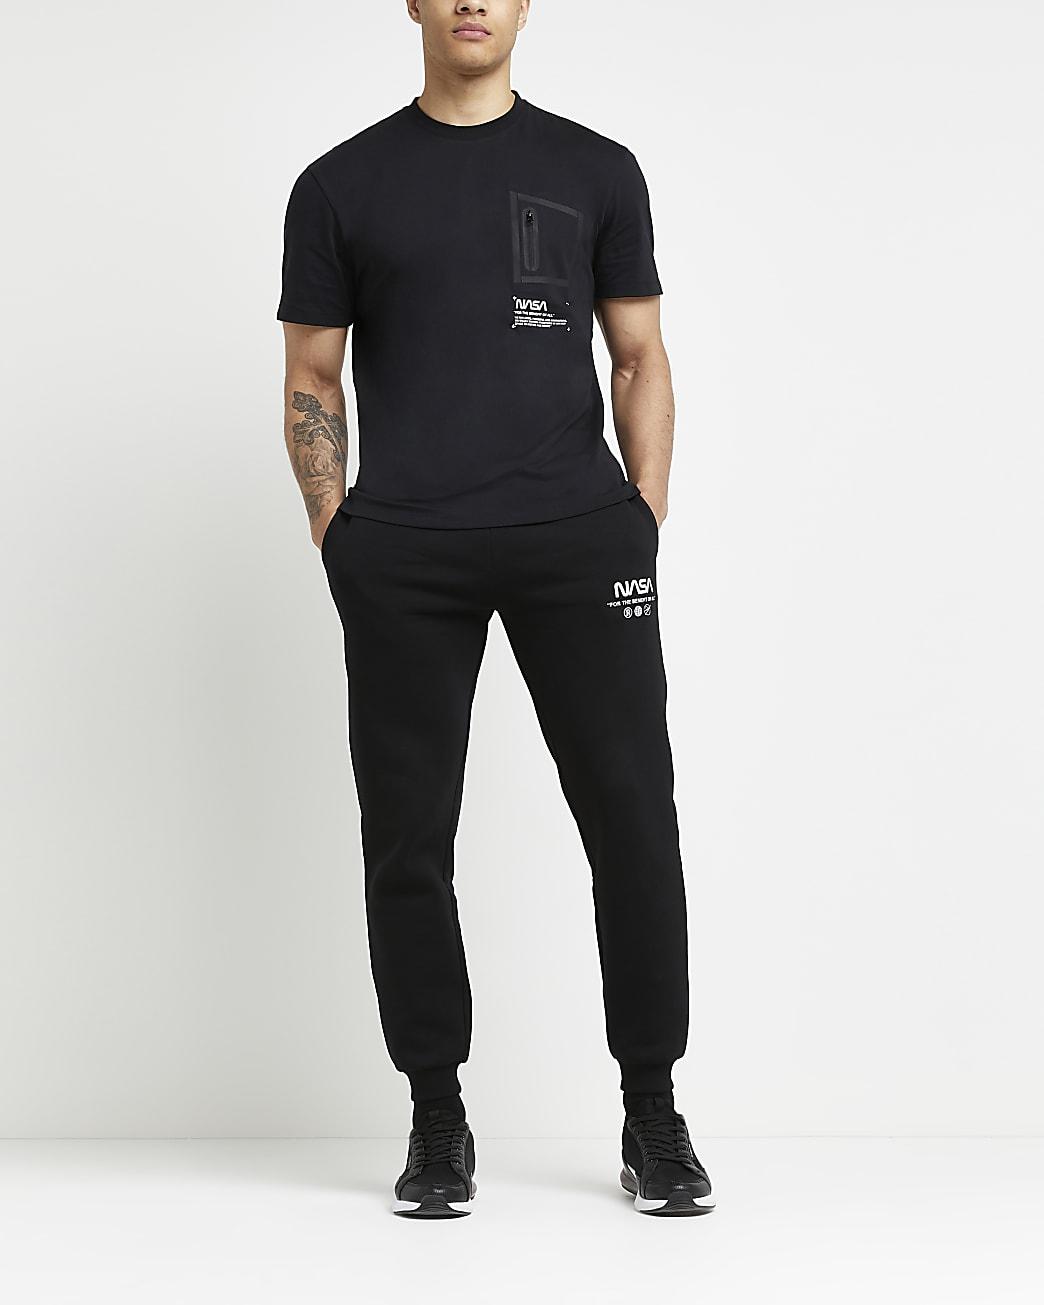 Black regular fit zip NASA graphic t-shirt